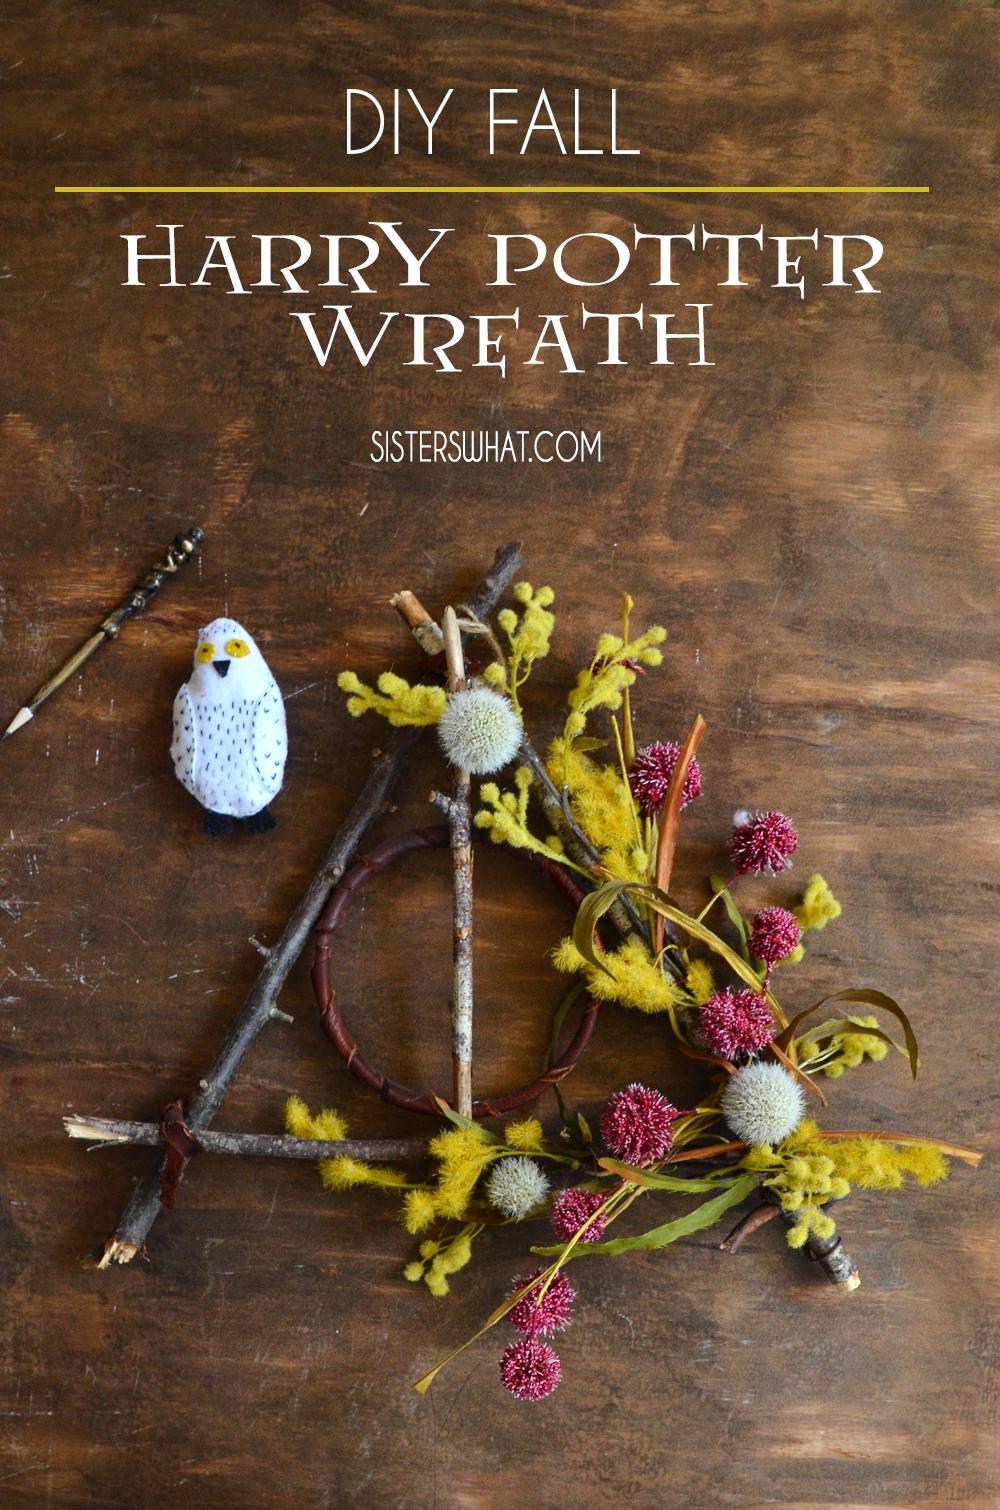 diy harry potter wreath fall wreath